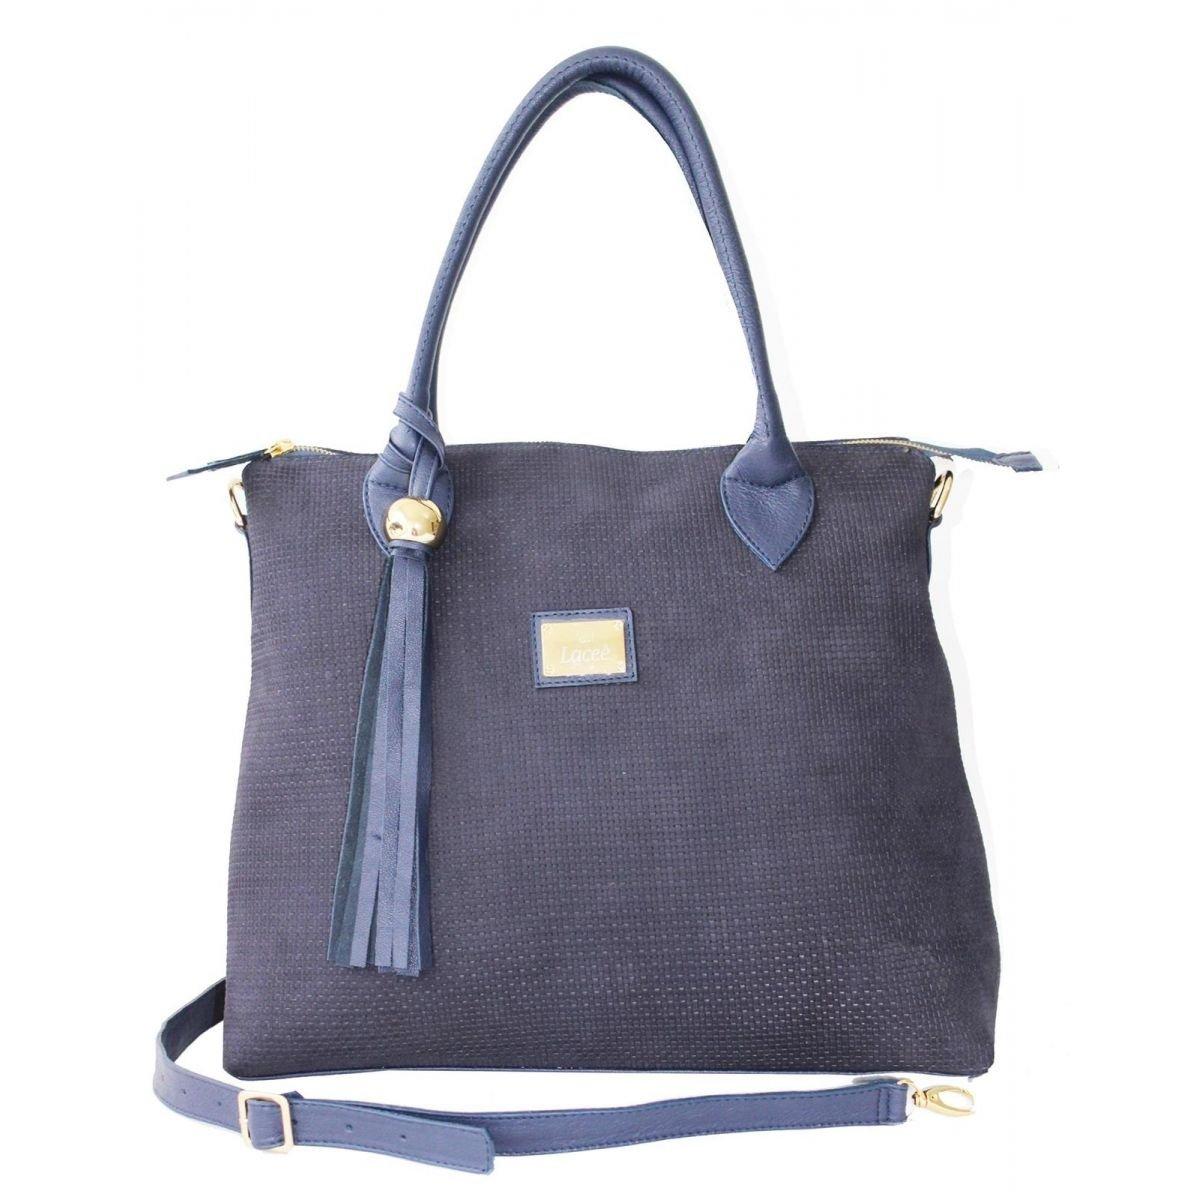 Bolsa Bolsa Trisse Trisse Laceê Laceê Azul Azul Bolsa Laceê dSXnxwO5vO